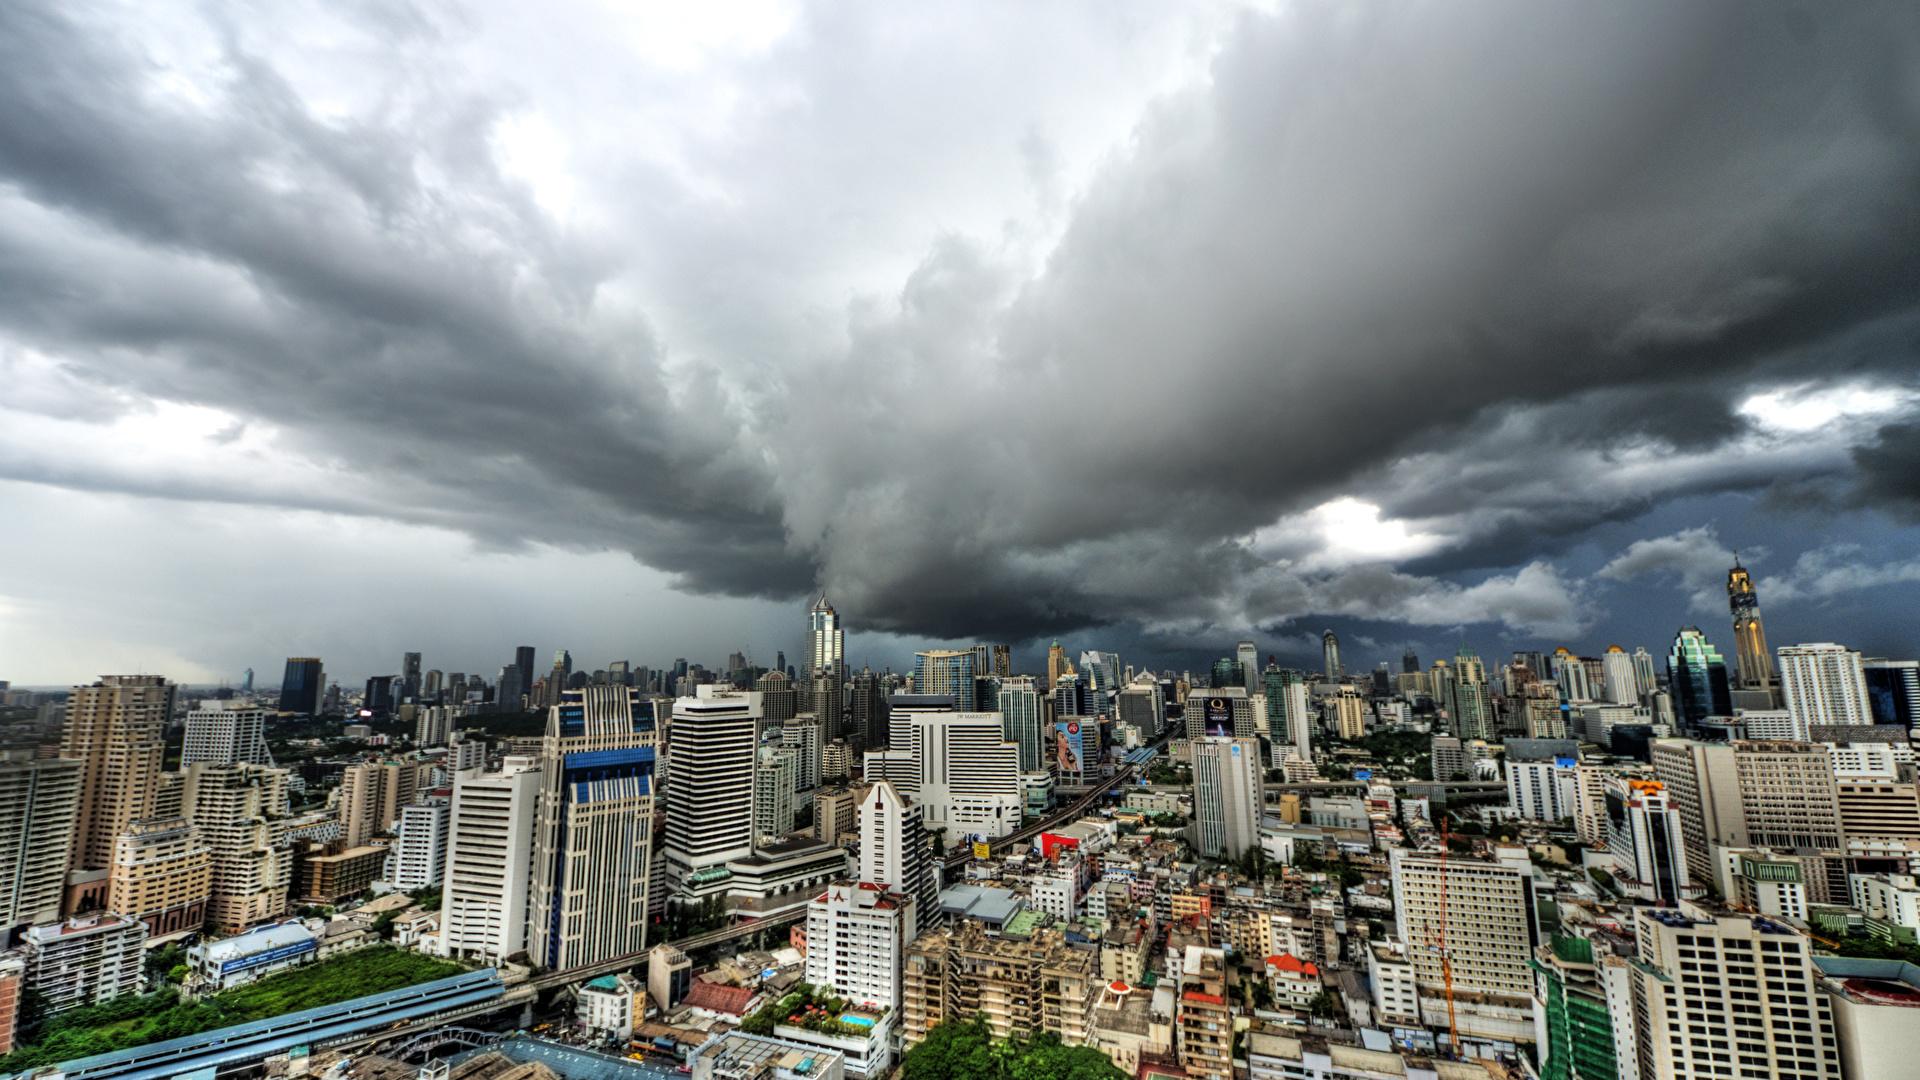 Achtergronden Bangkok Thailand megalopolis Huizen Wolken een stad 1920x1080 Metropool gebouw Steden gebouwen